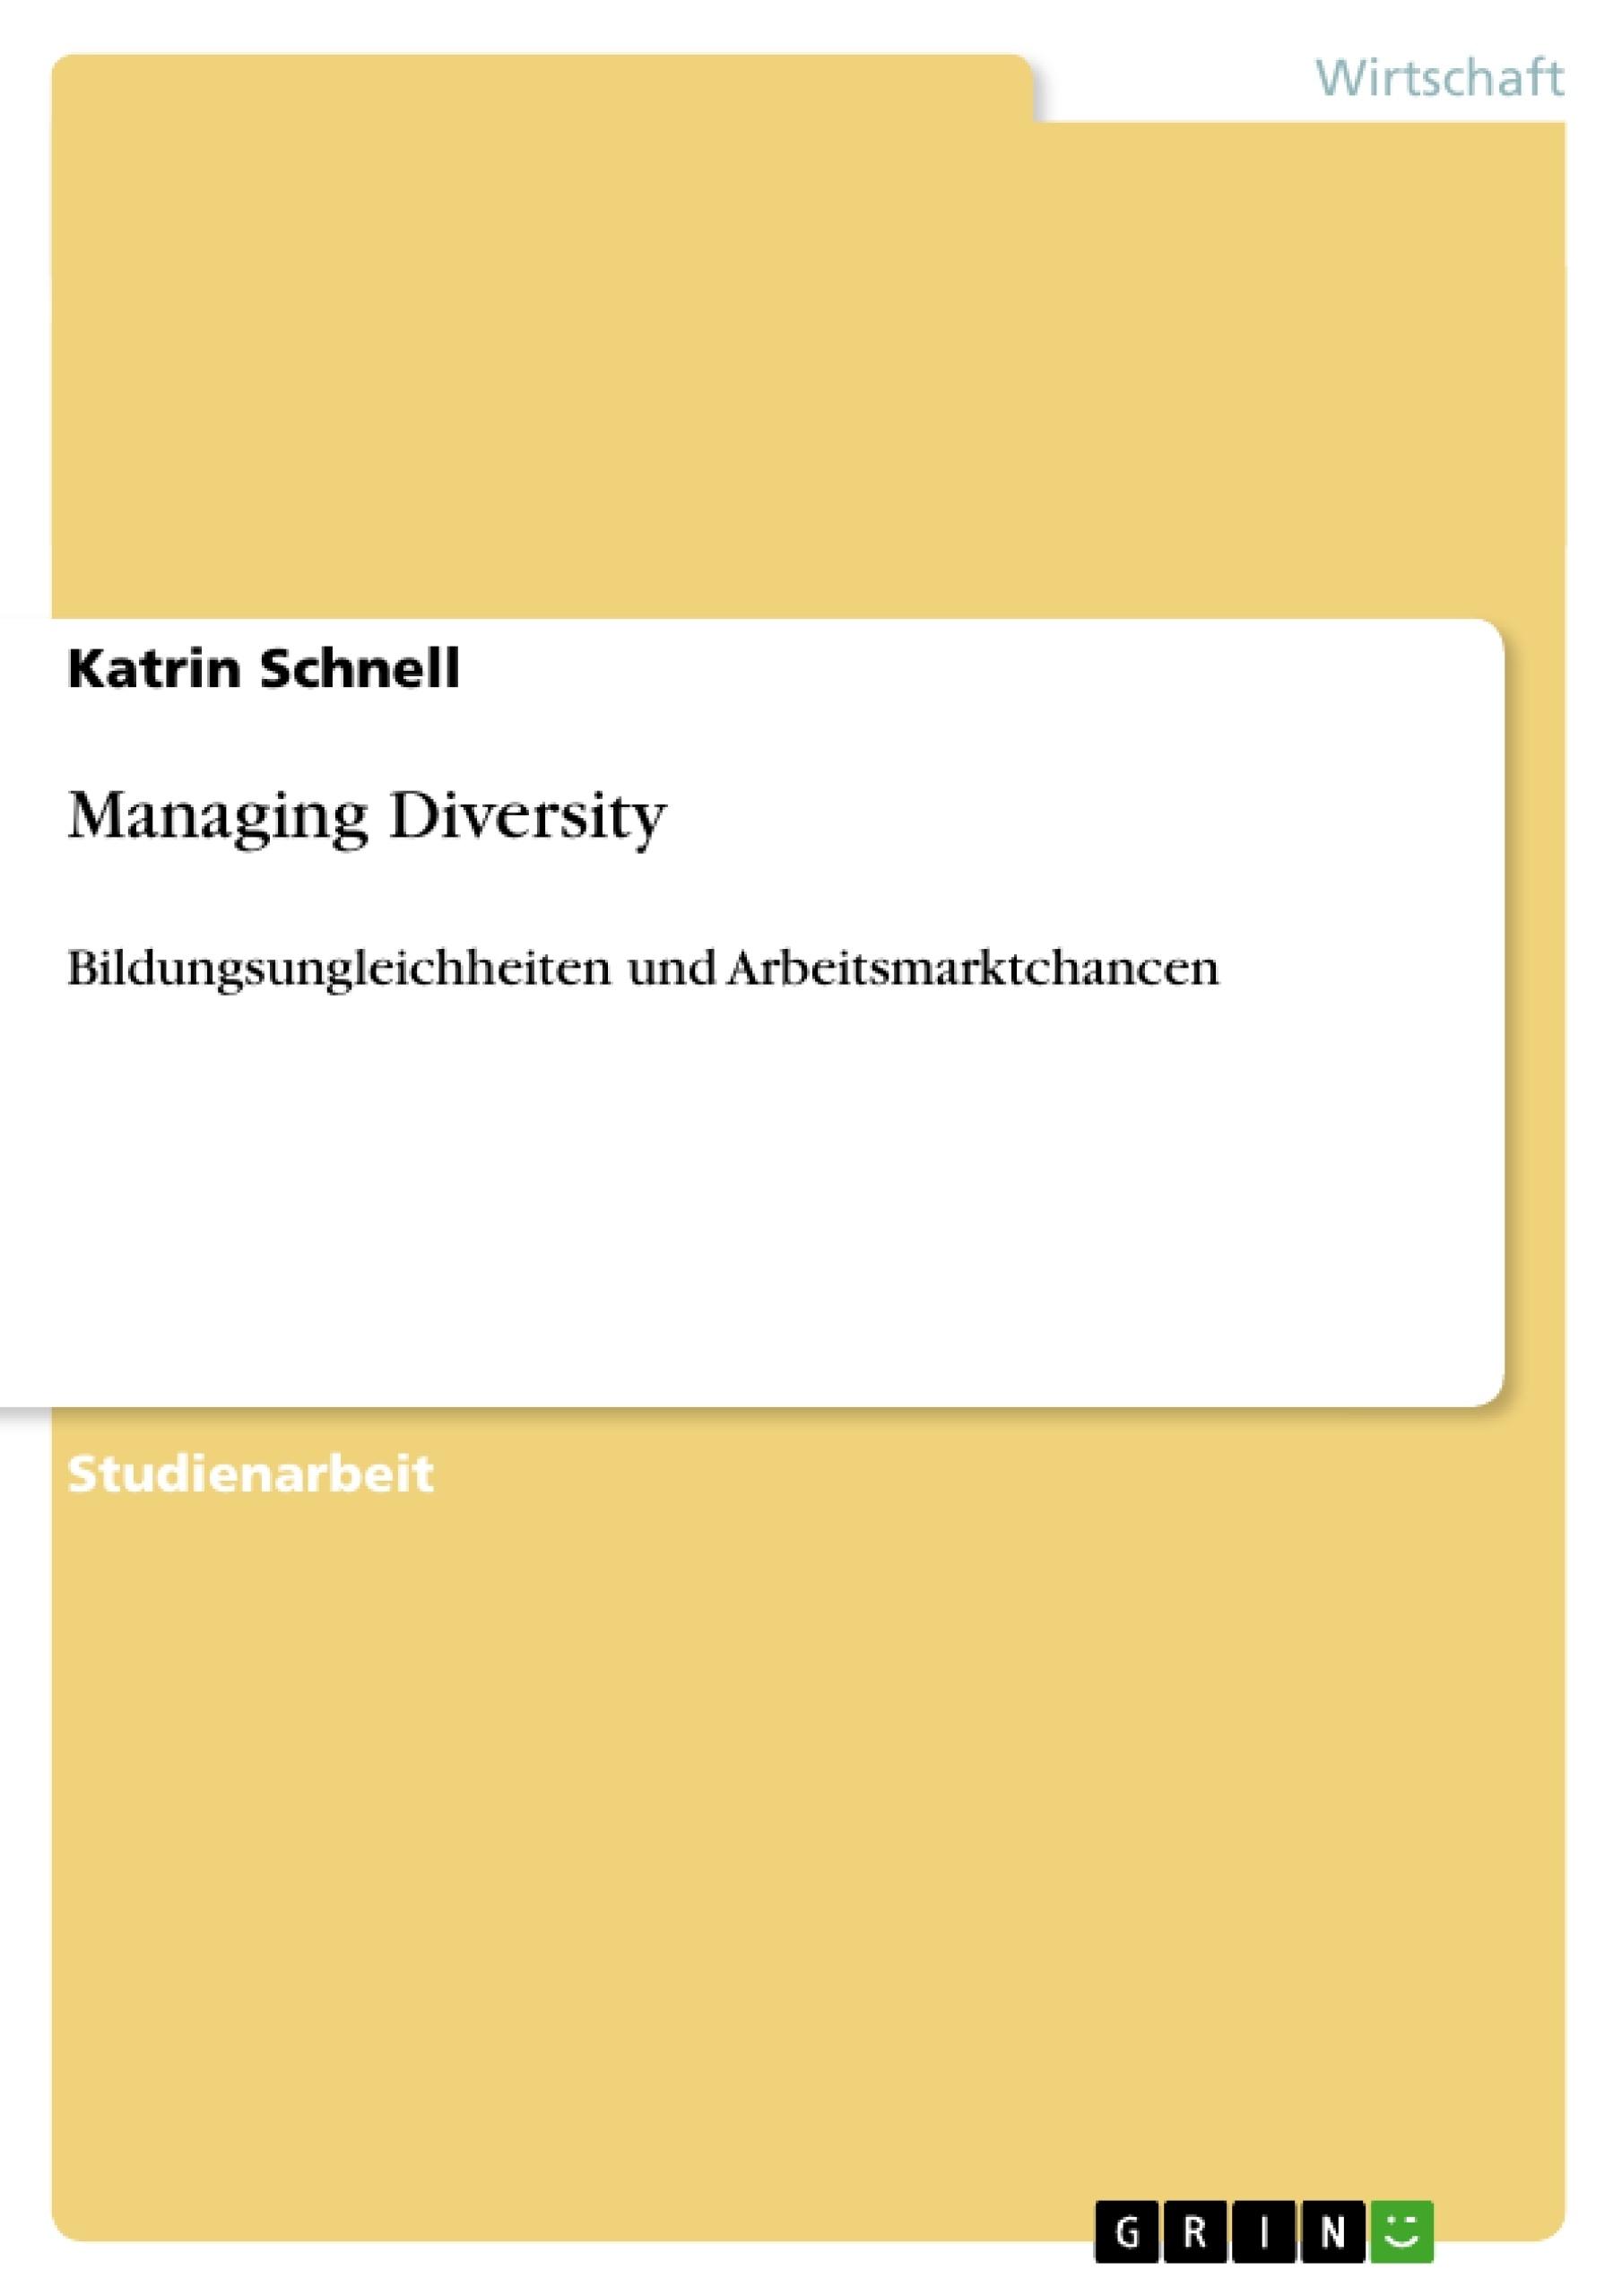 Titel: Managing Diversity